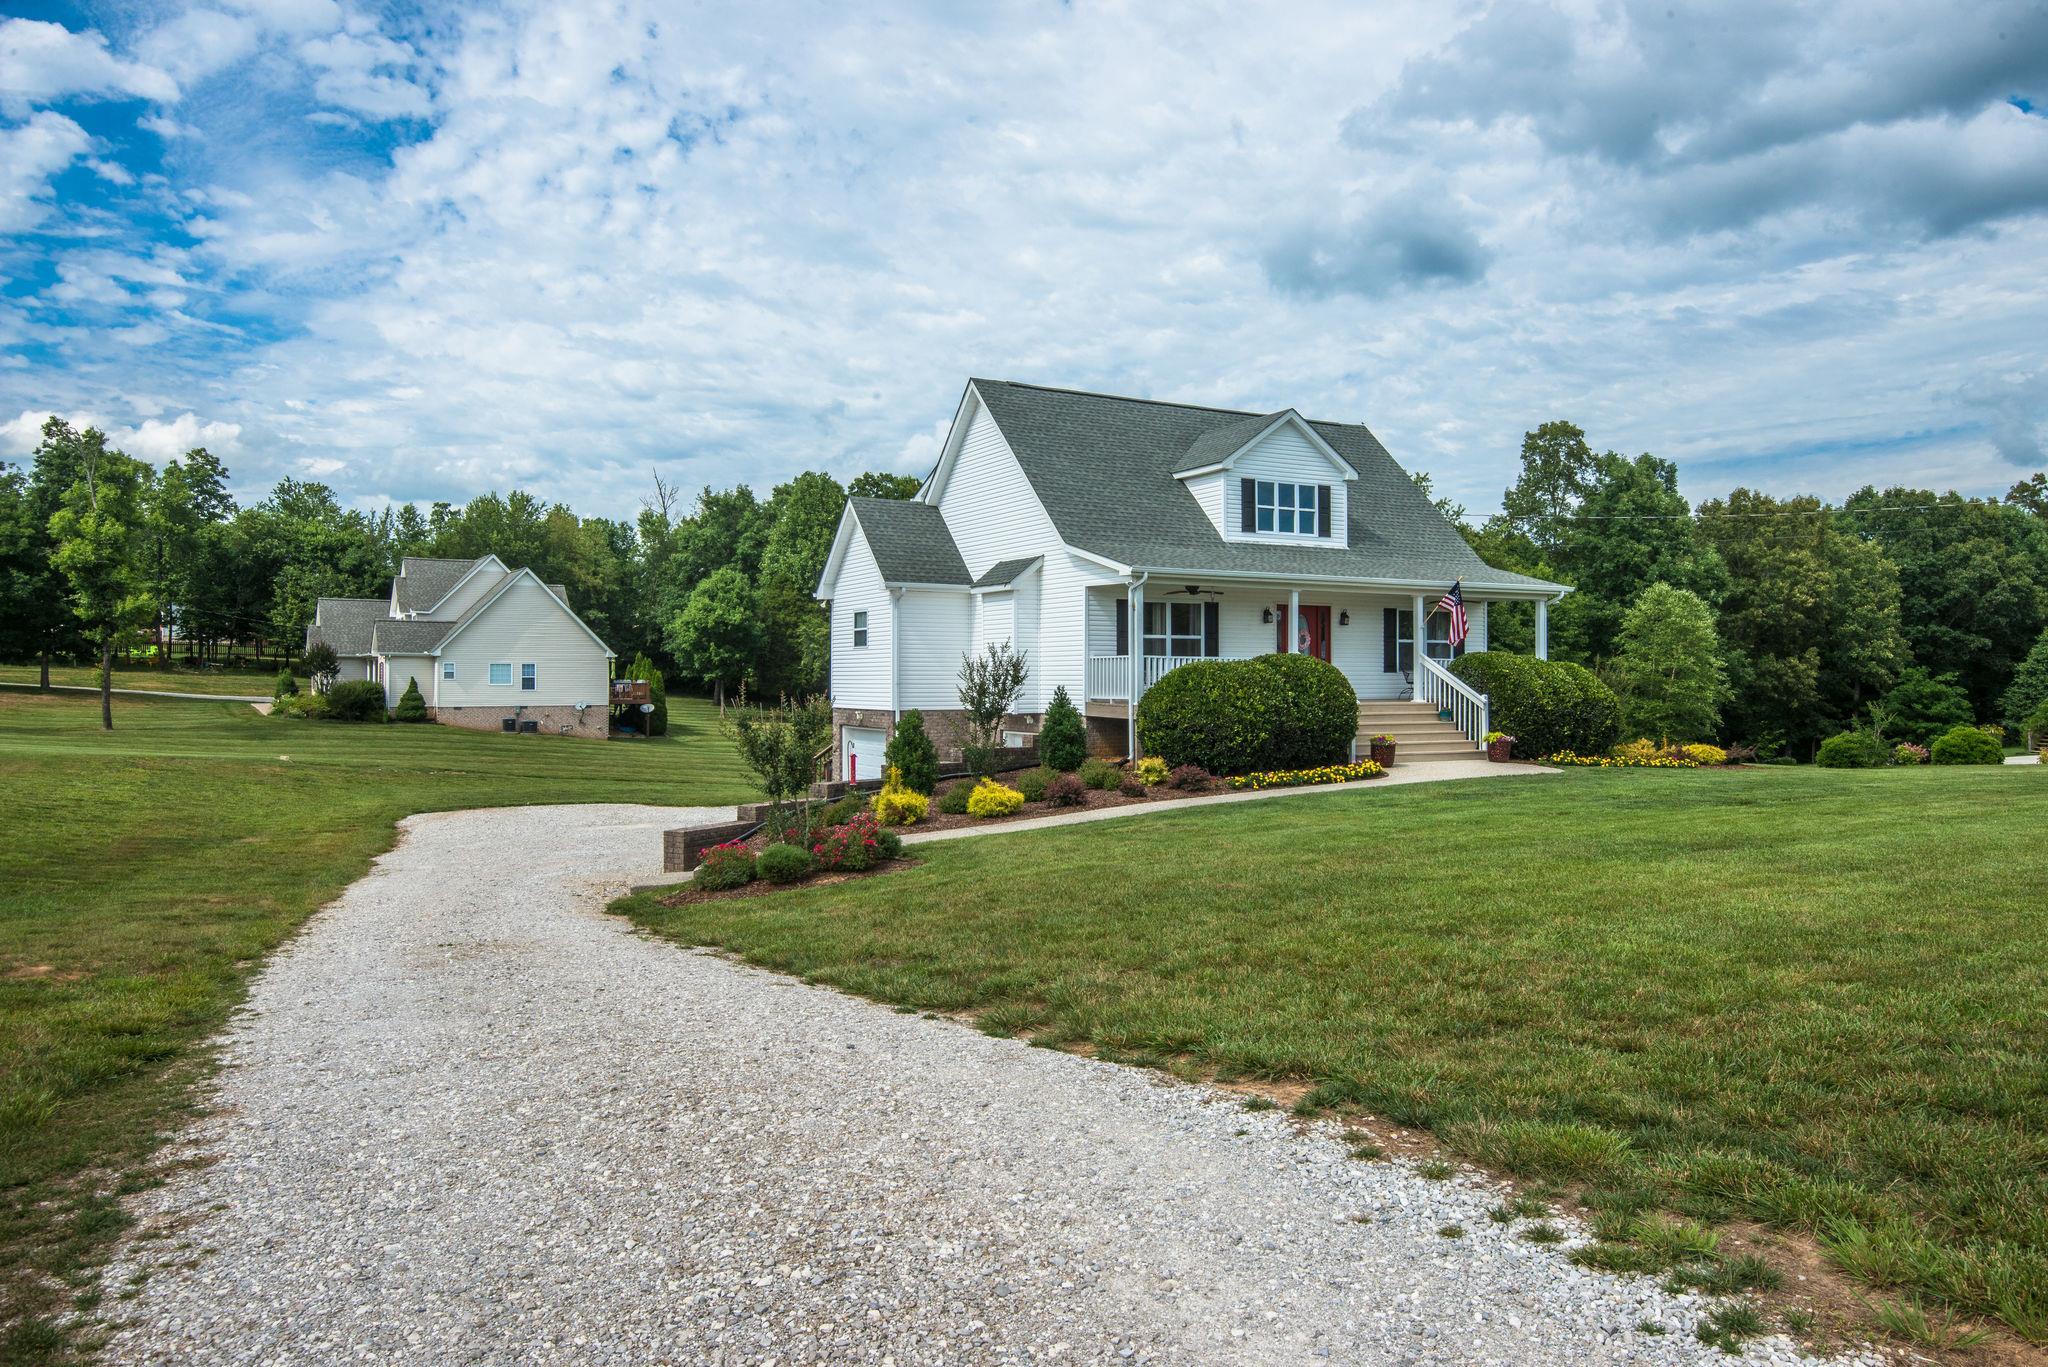 501 Fawn Ct, Burns, TN 37029 - Burns, TN real estate listing